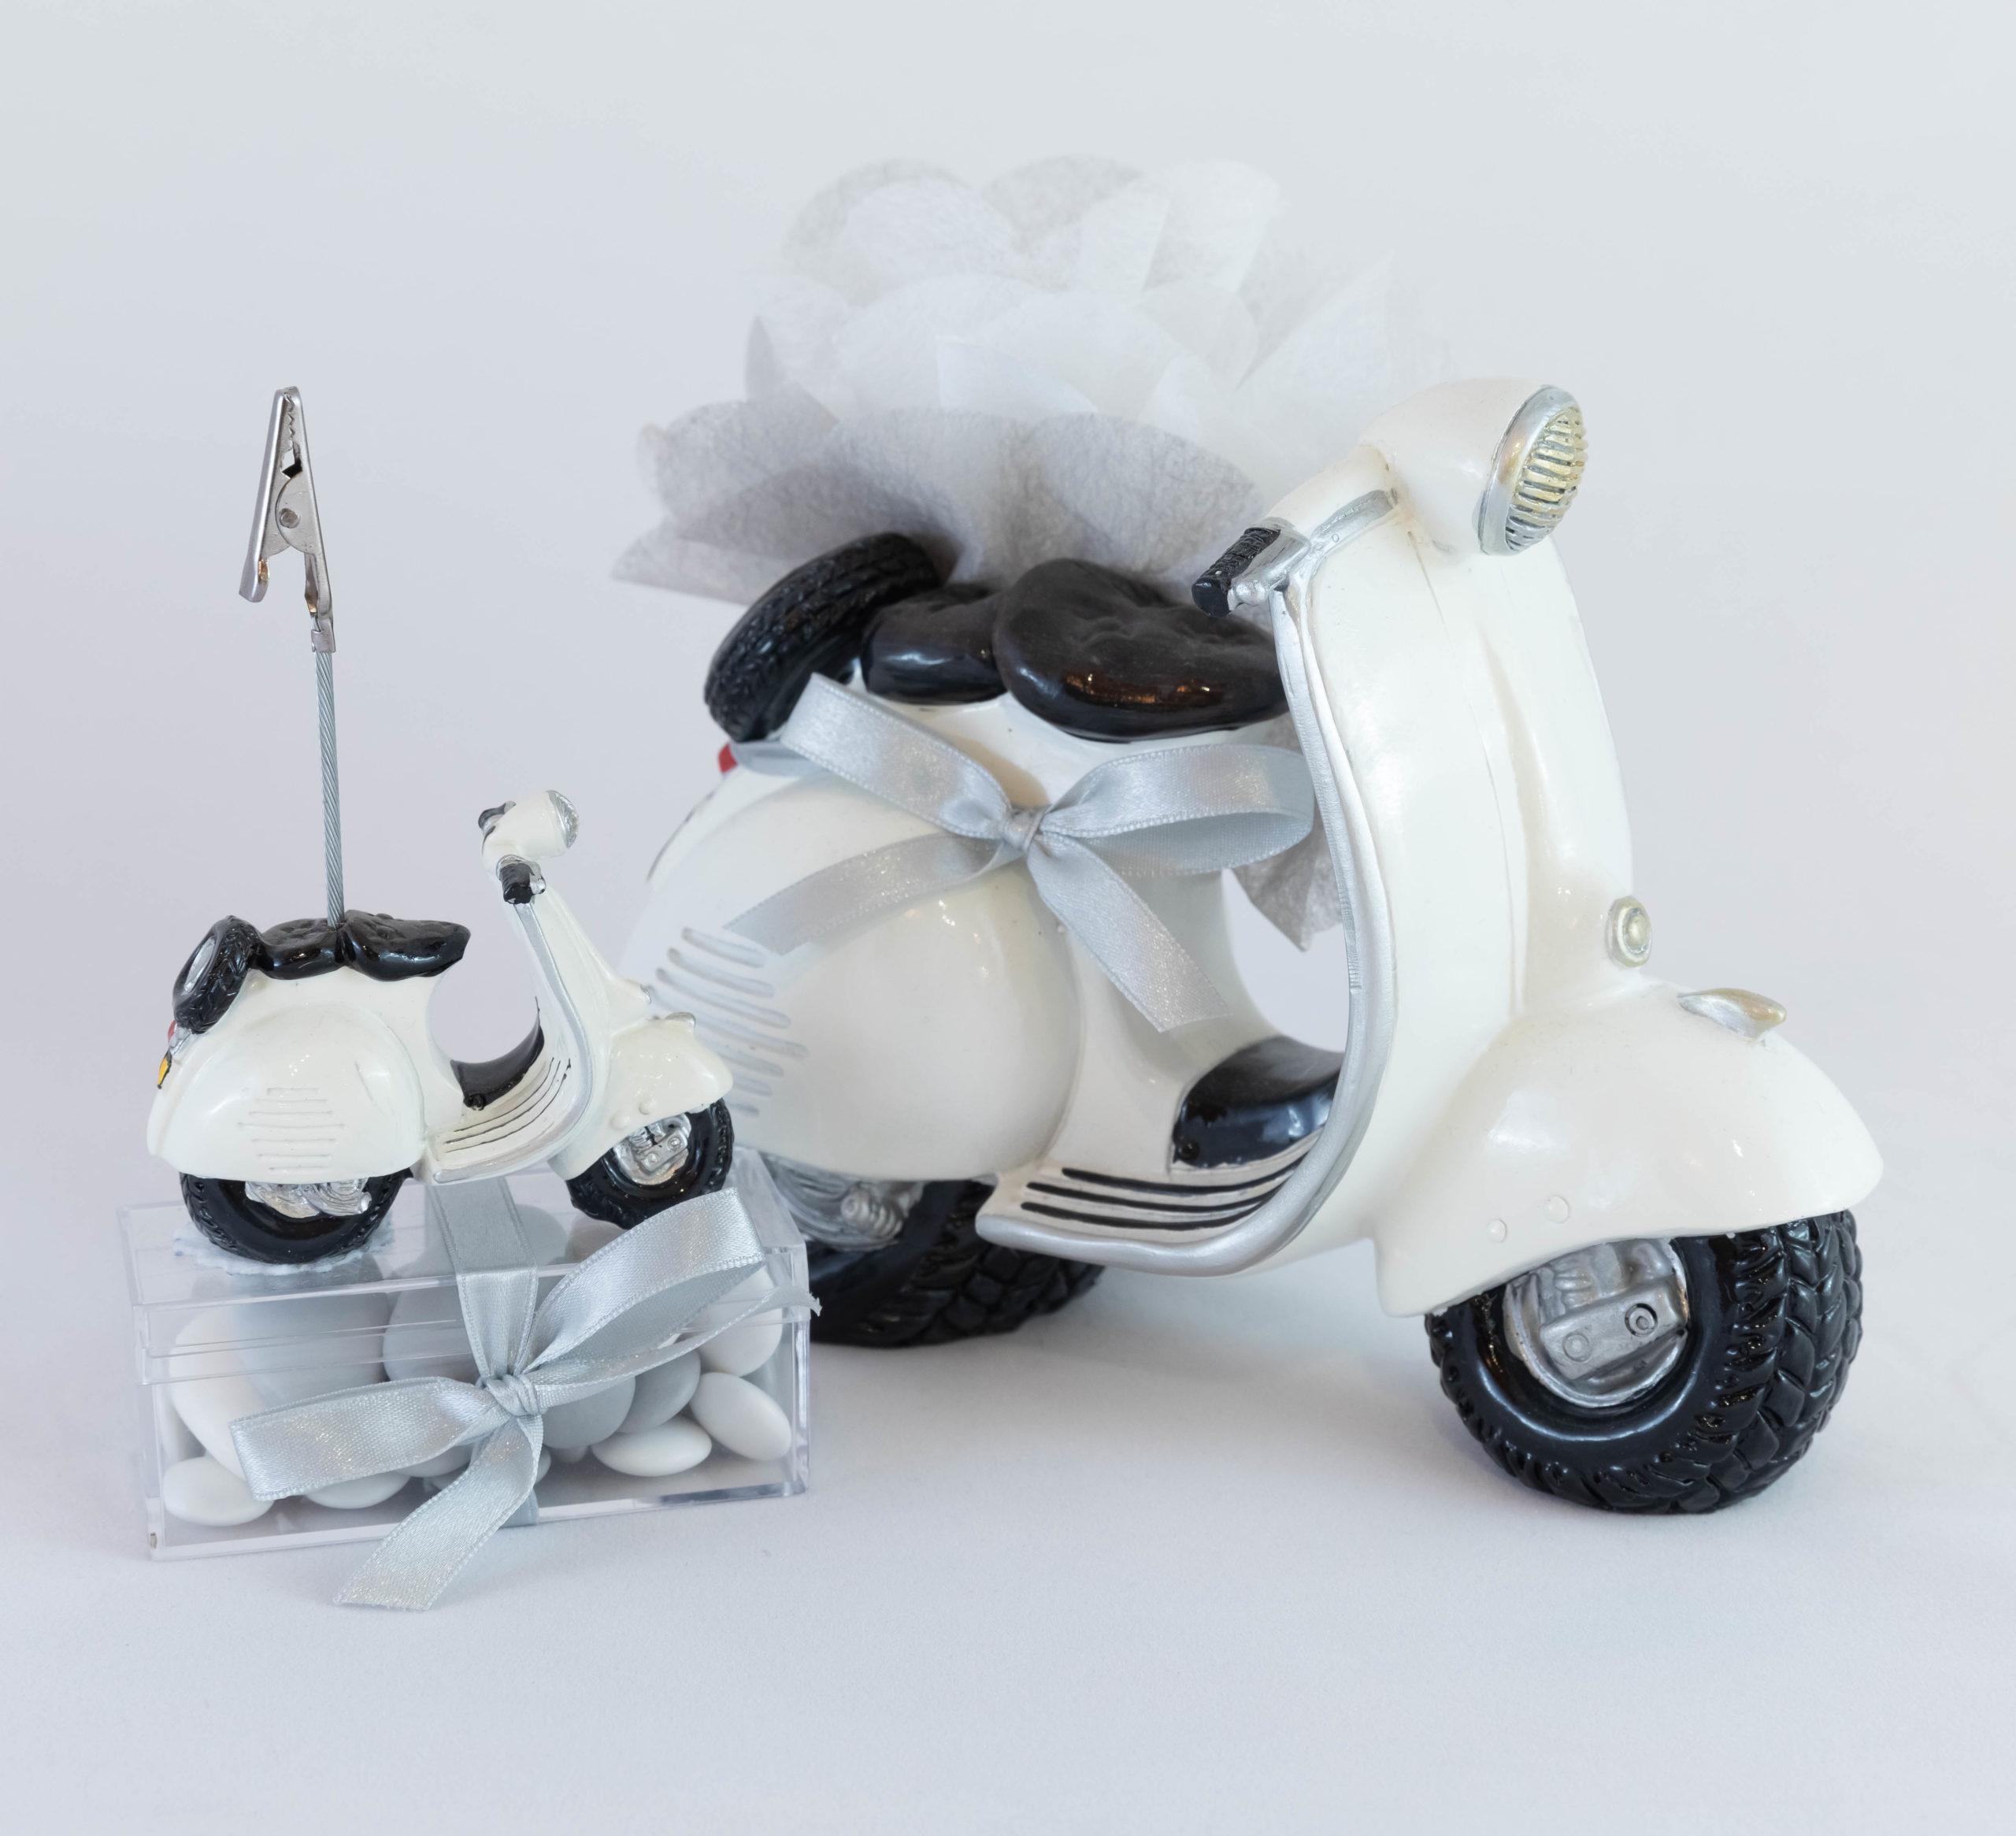 Scooter blanc Ensemble - Véhicule Image